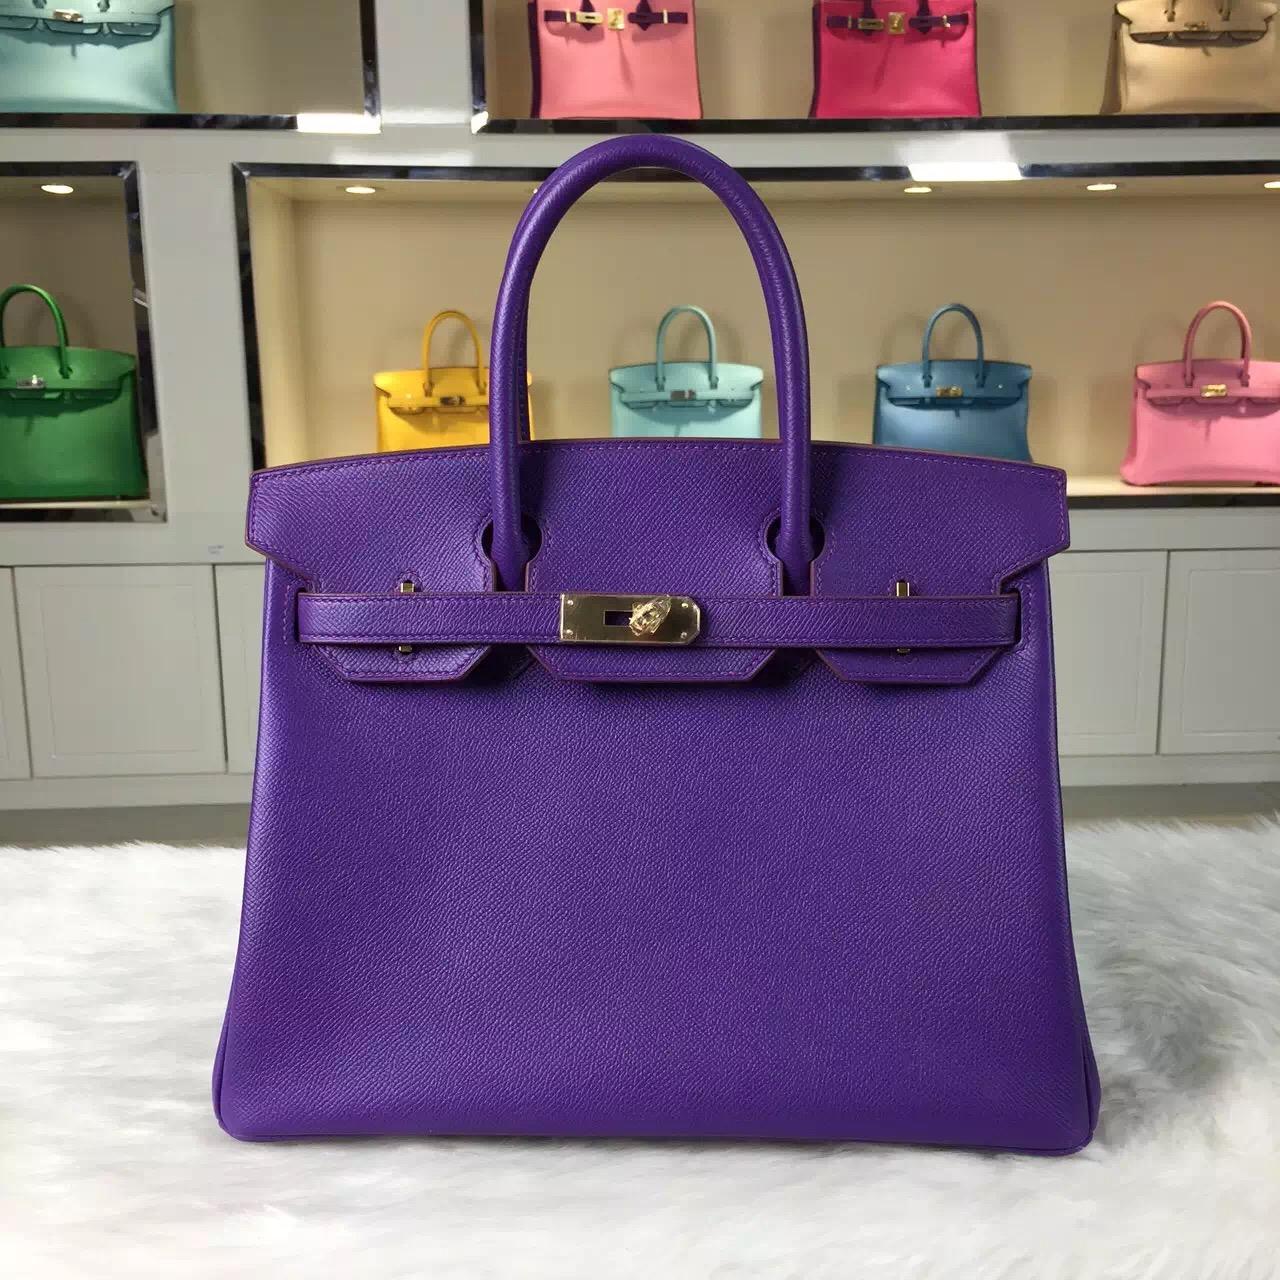 Wholesale Hermes Birkin 30CM Multi-color Original Epsom Leather Ladies' Tote Bag